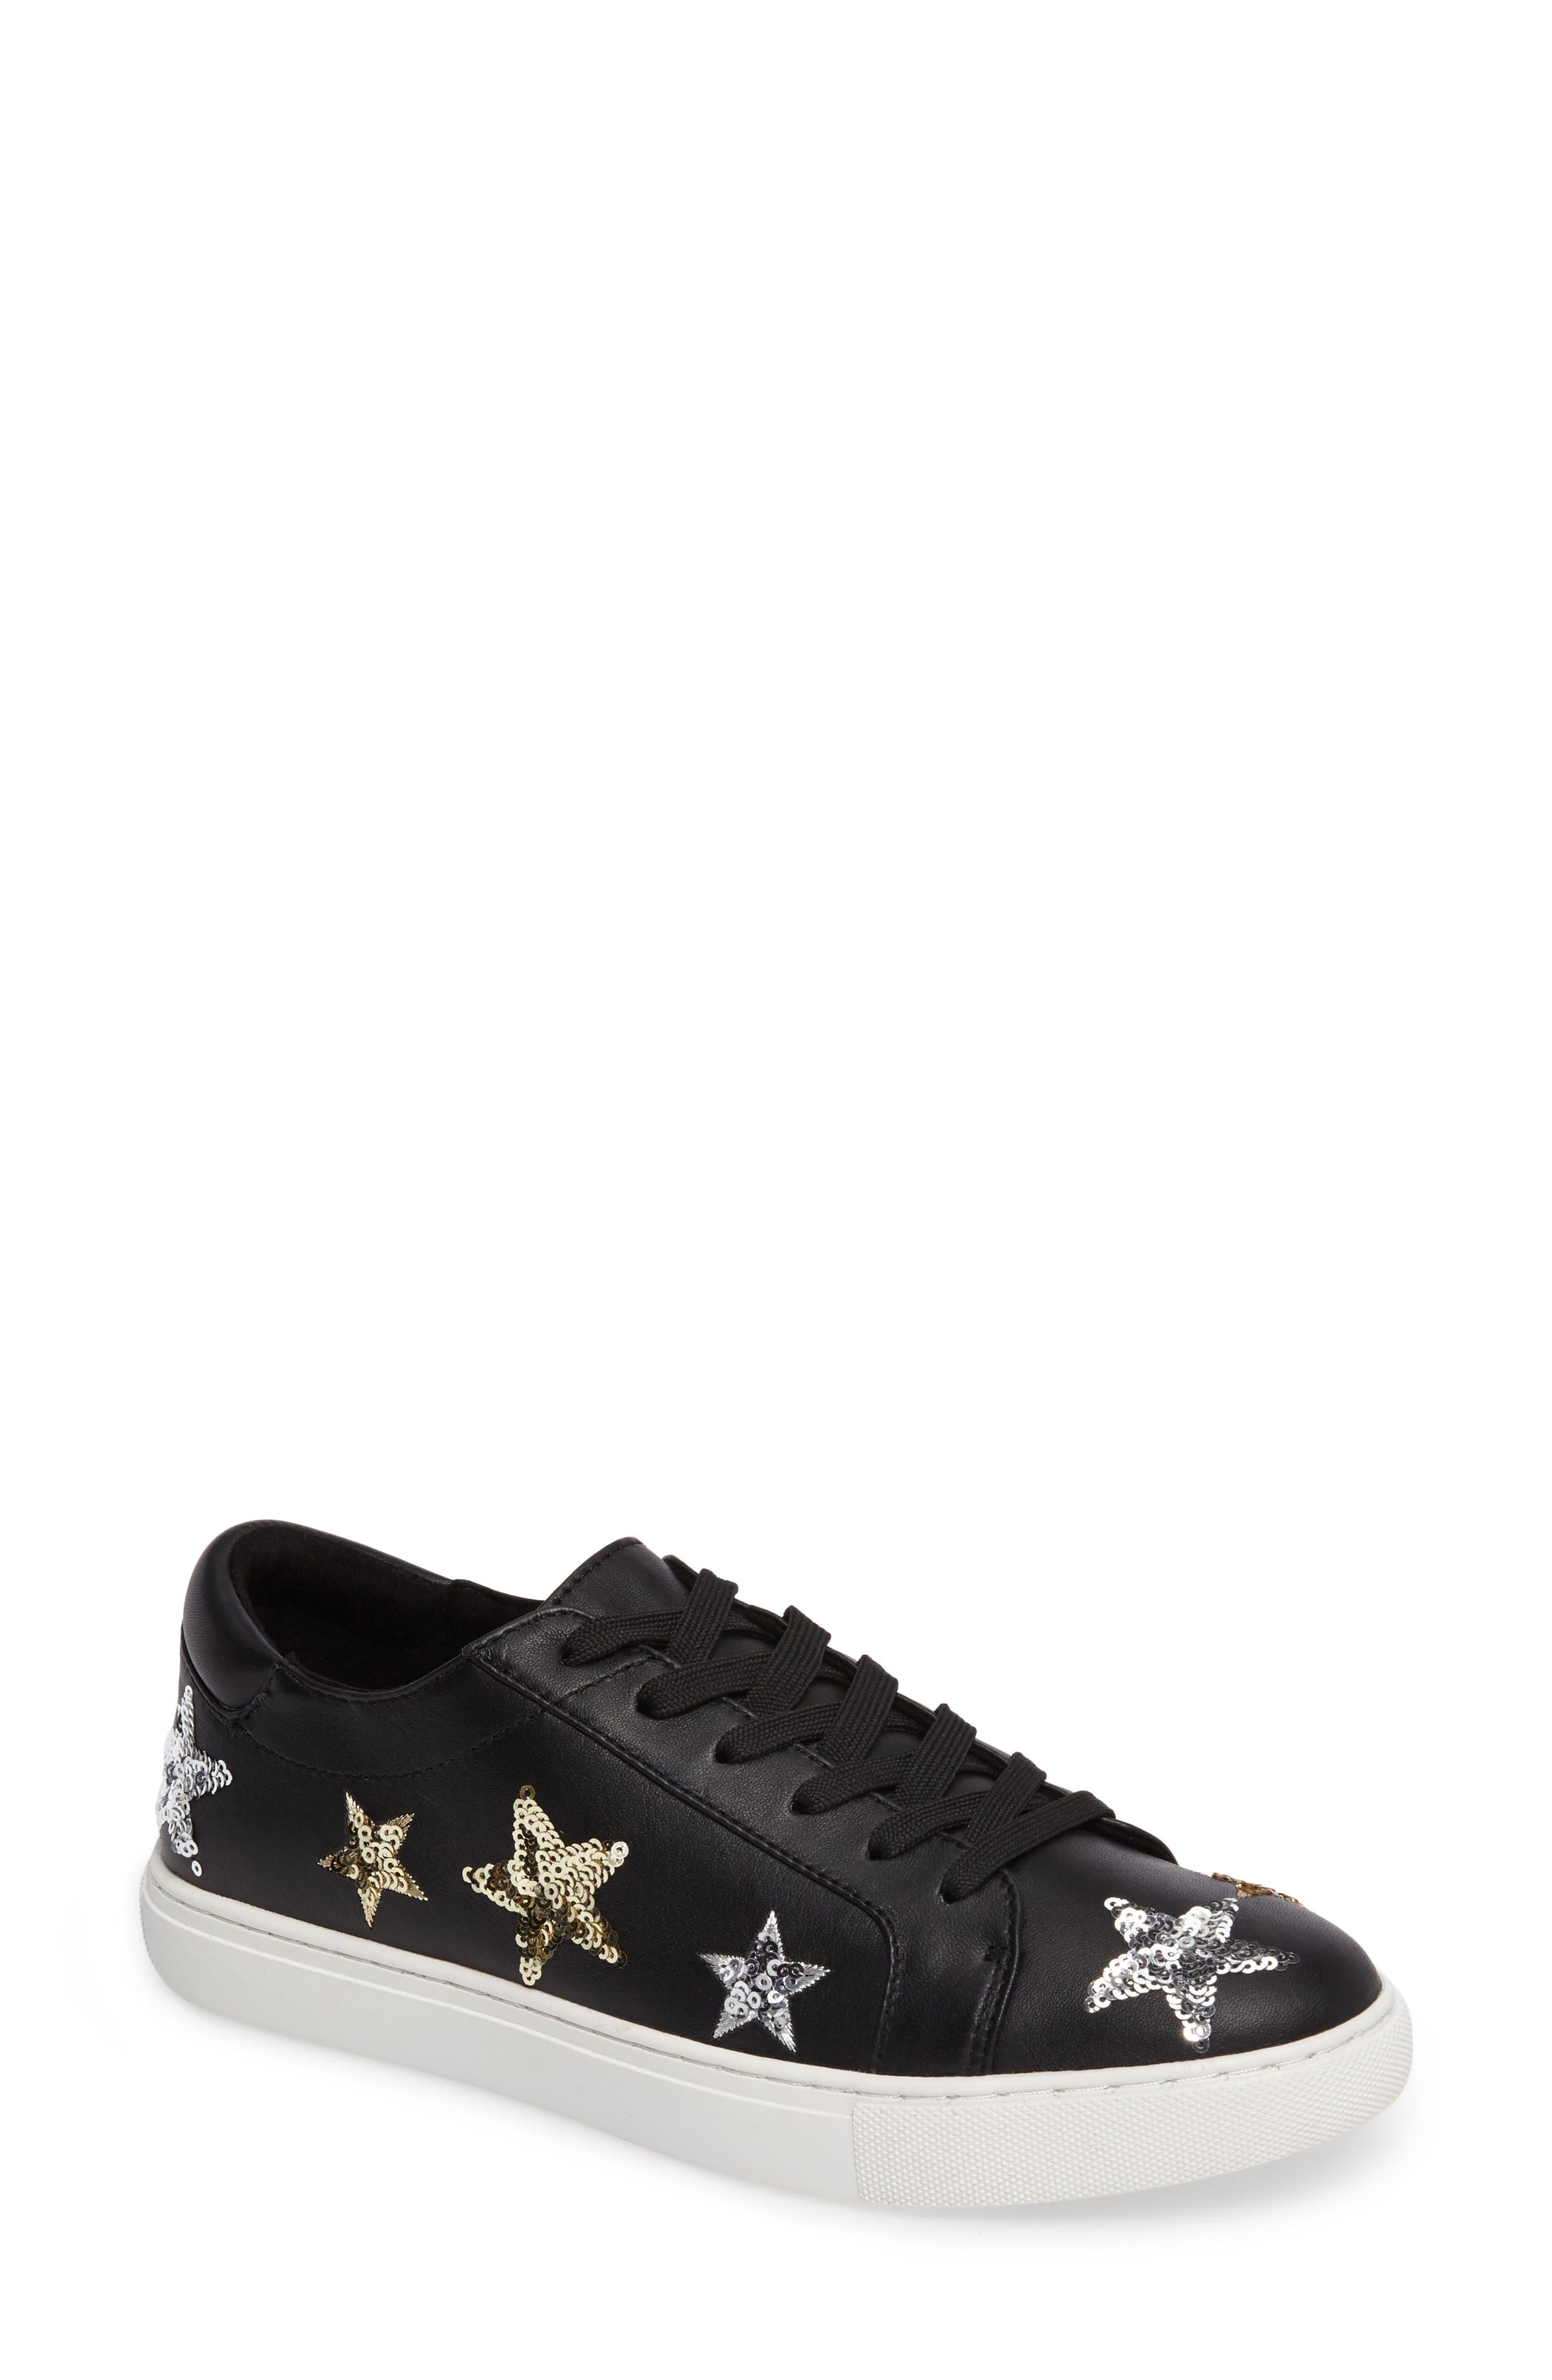 KENNETH COLE NEW YORK Kam Star Sneaker